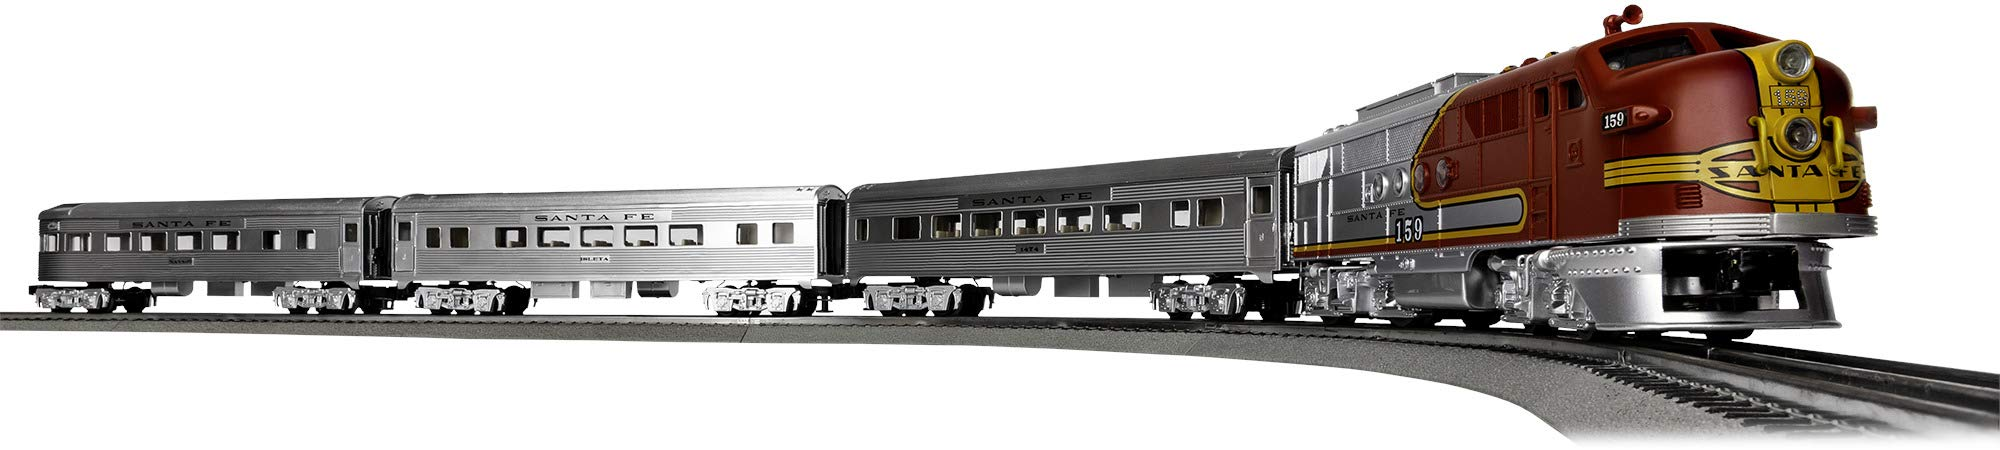 Lionel Santa Fe Super Chief Electric O Gauge Model Train Set w/ Remote and Bluetooth Capability by Lionel